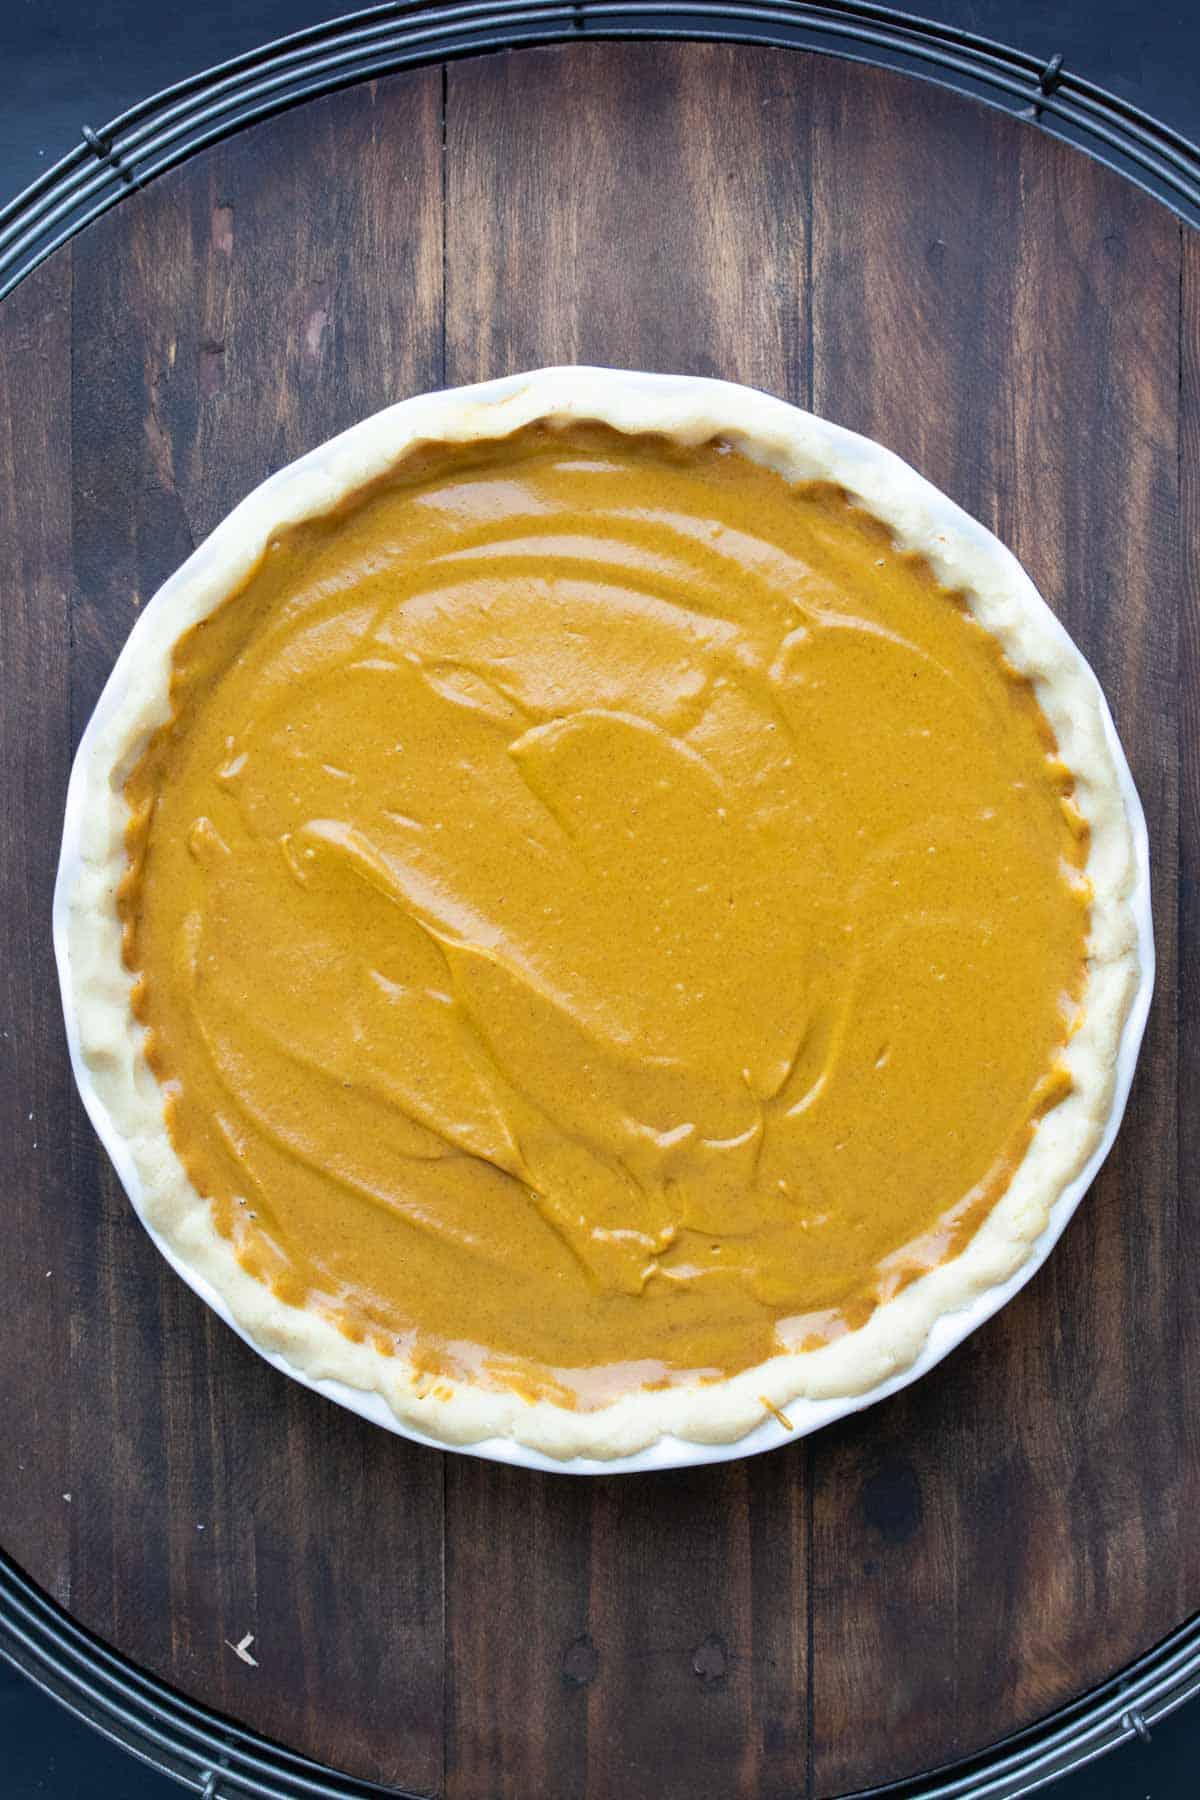 A raw pumpkin pie in a pie crust on a wooden surface